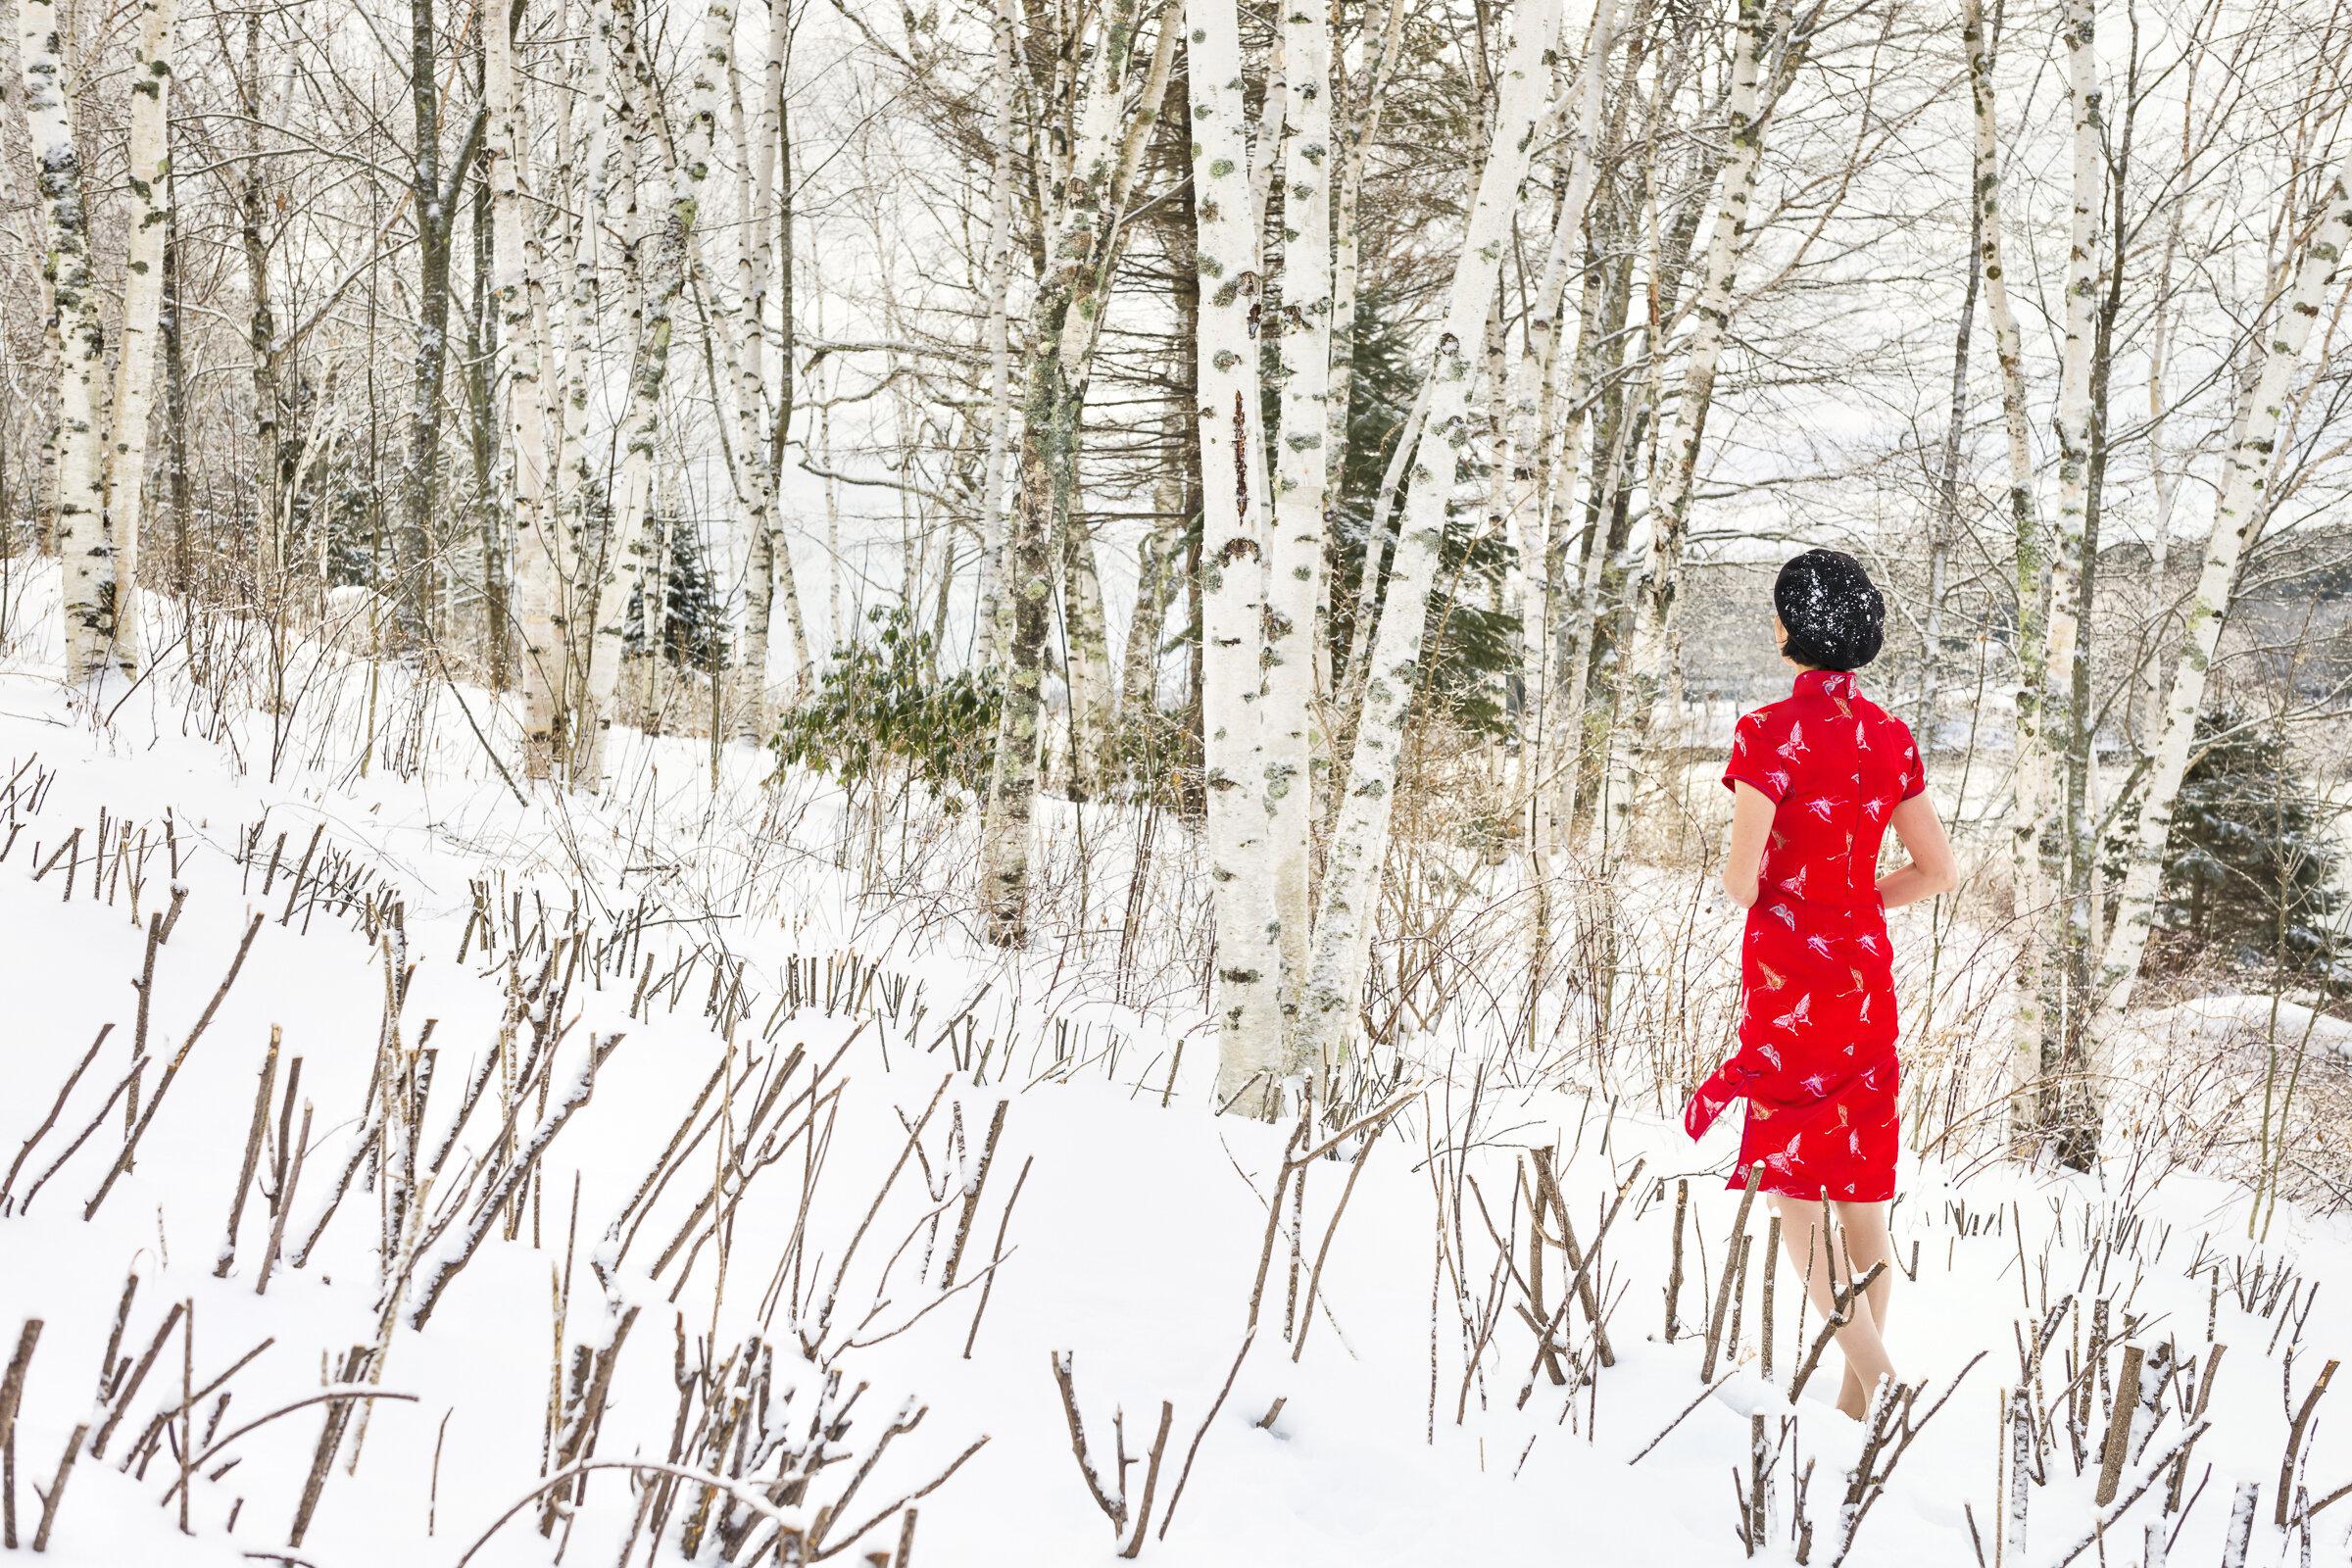 In America-Winter #11